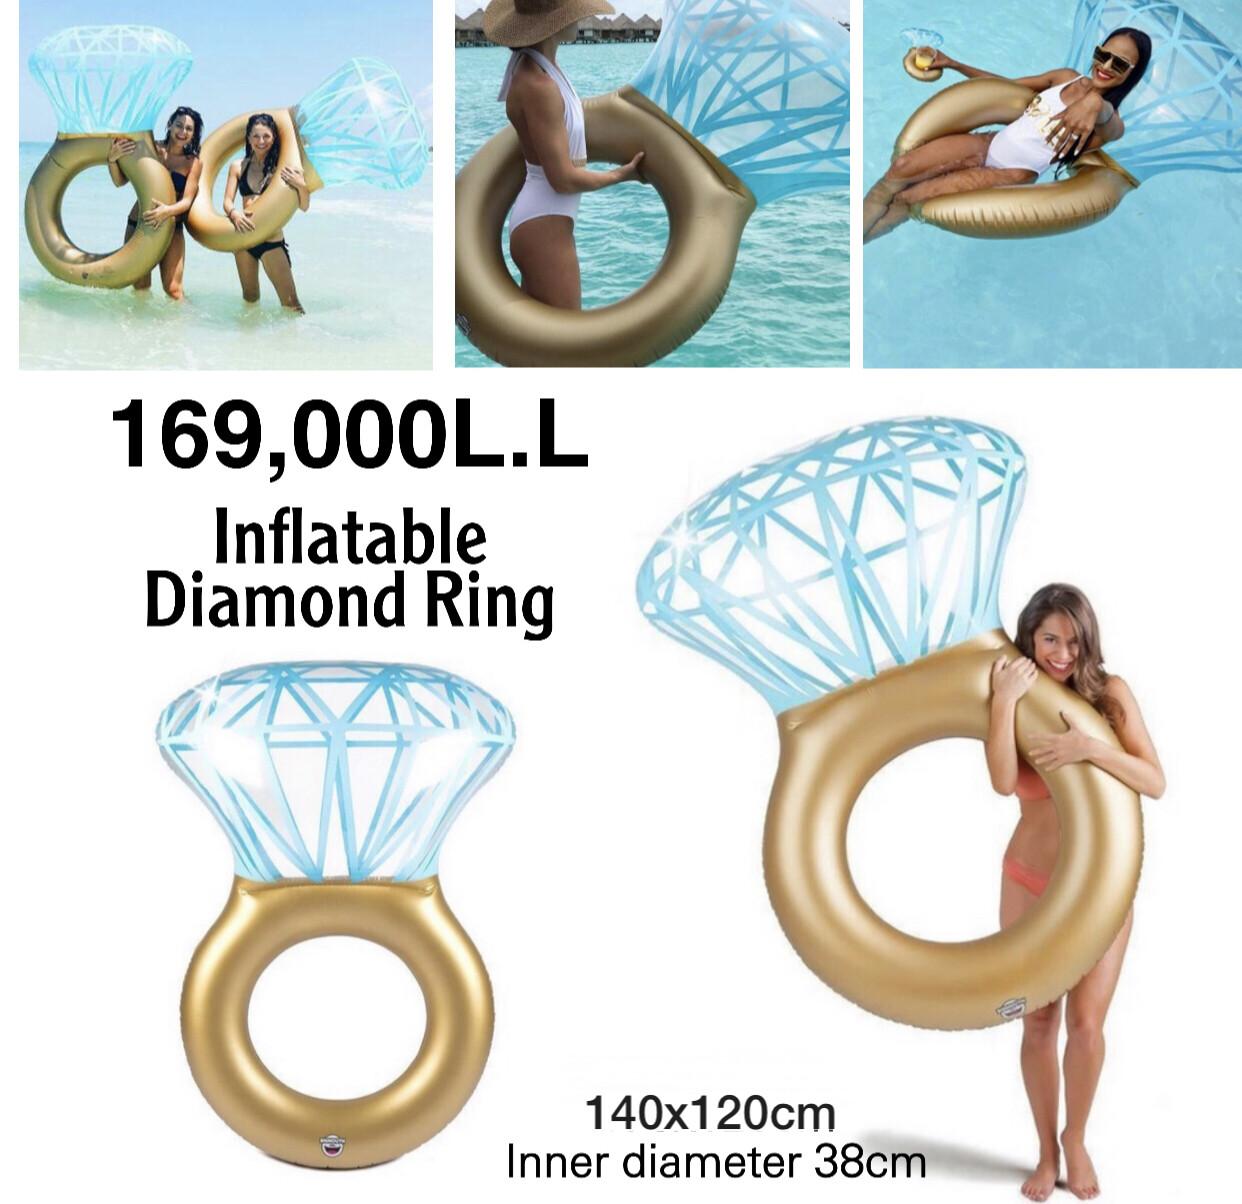 Inflatable Diamond Ring